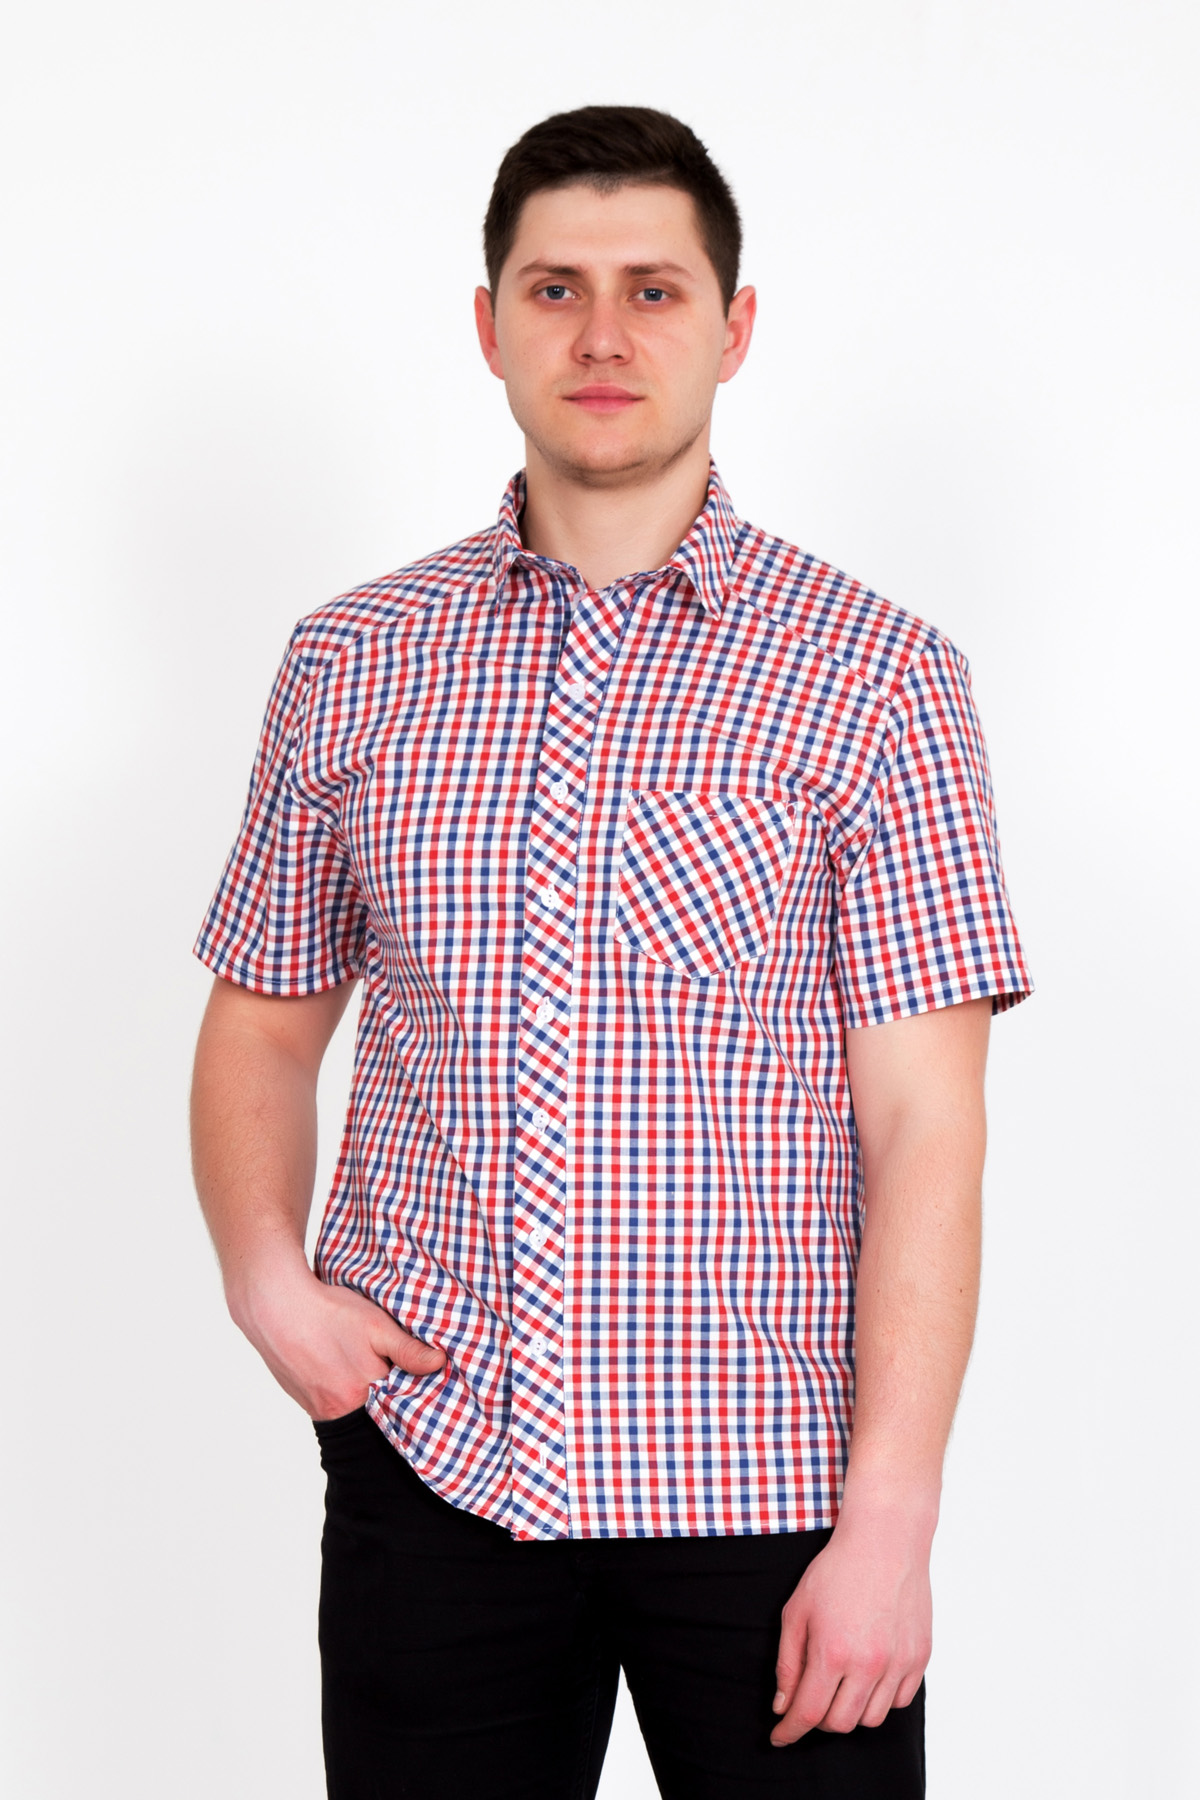 Муж. рубашка Оливер р. 64Рубашки<br>Обхват груди:128 см<br>Обхват талии:124 см<br>Обхват бедер:128 см<br>Длина по спинке:78 см<br>Рост:178-188 см<br><br>Тип: Муж. рубашка<br>Размер: 64<br>Материал: Сорочечная перкаль